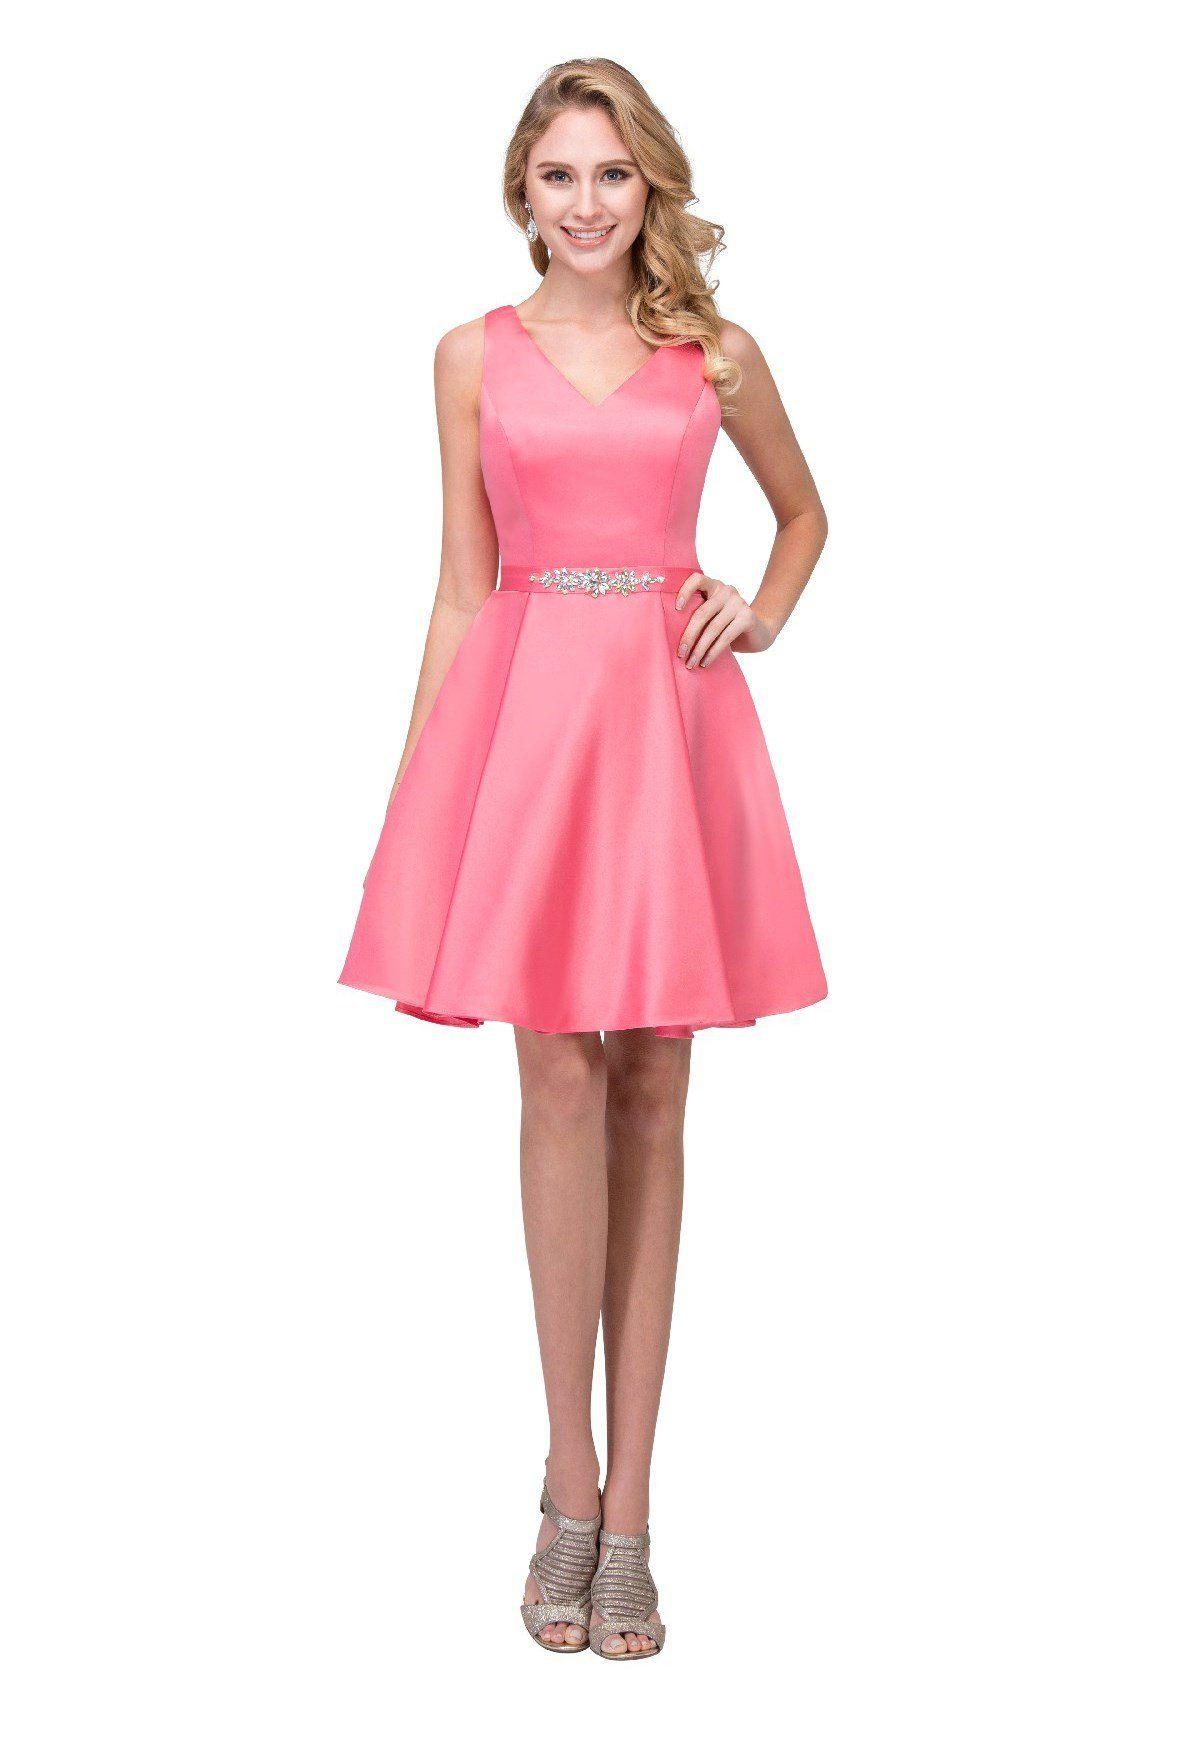 V-Neck Short Glitter-Knit Homecoming Party Dress